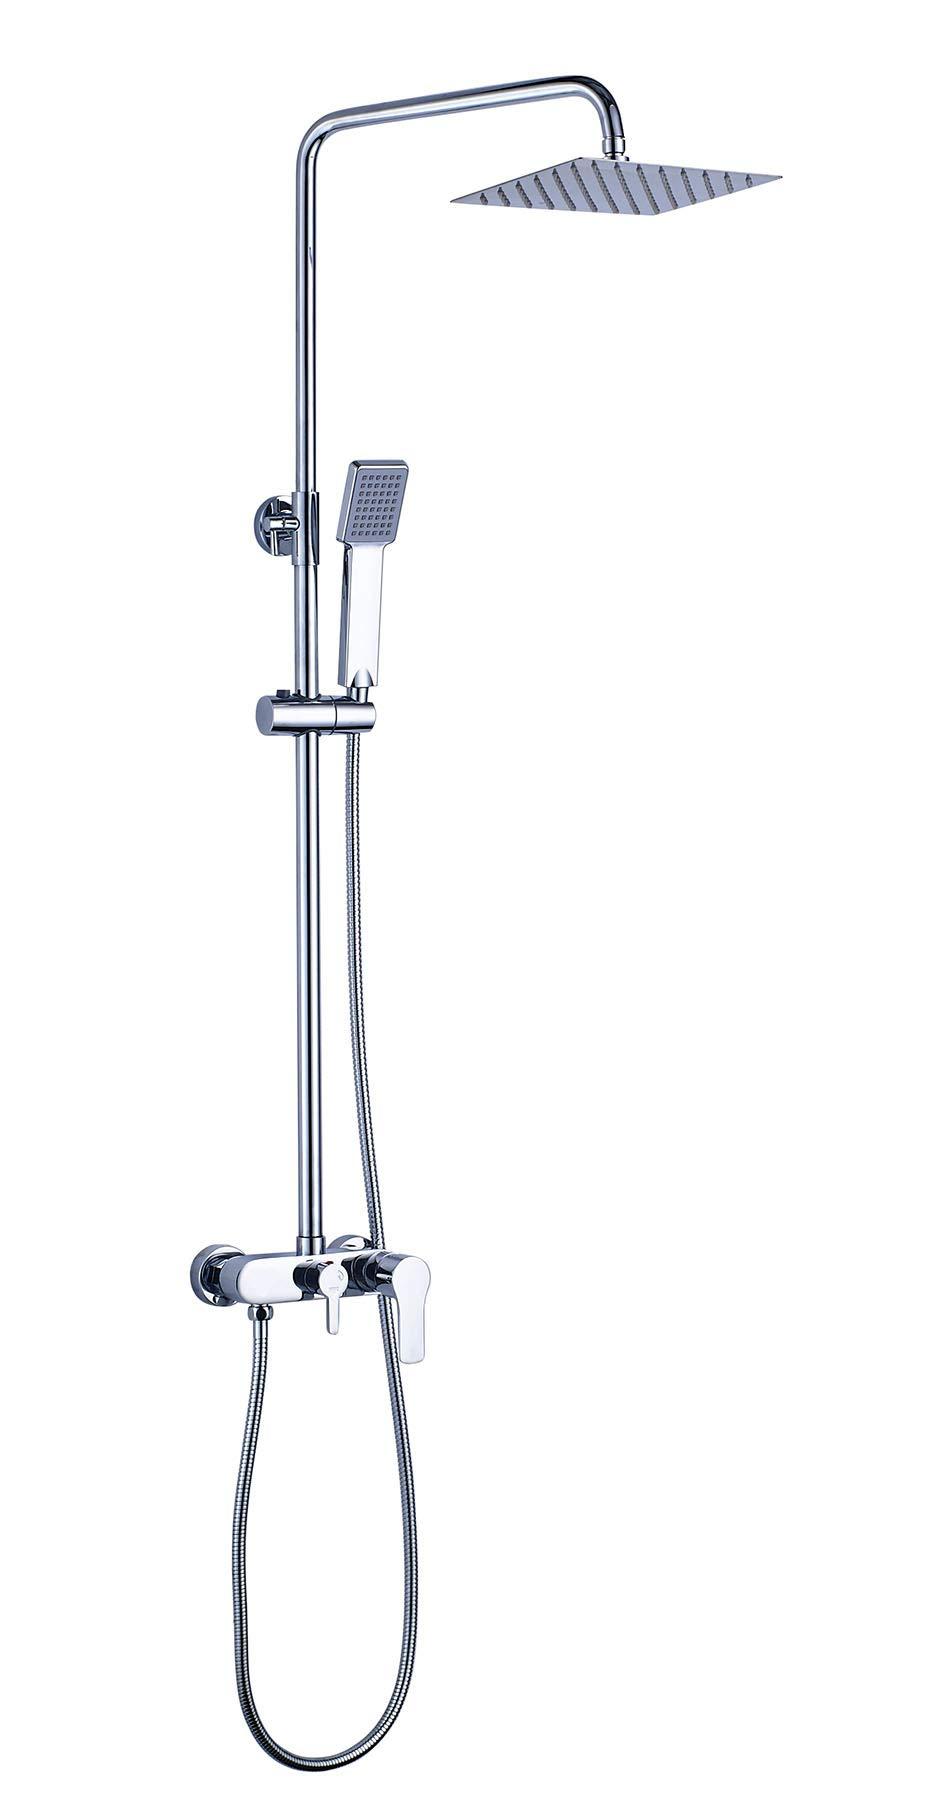 OXEN Vera – Columna de ducha monomando (extra larga)